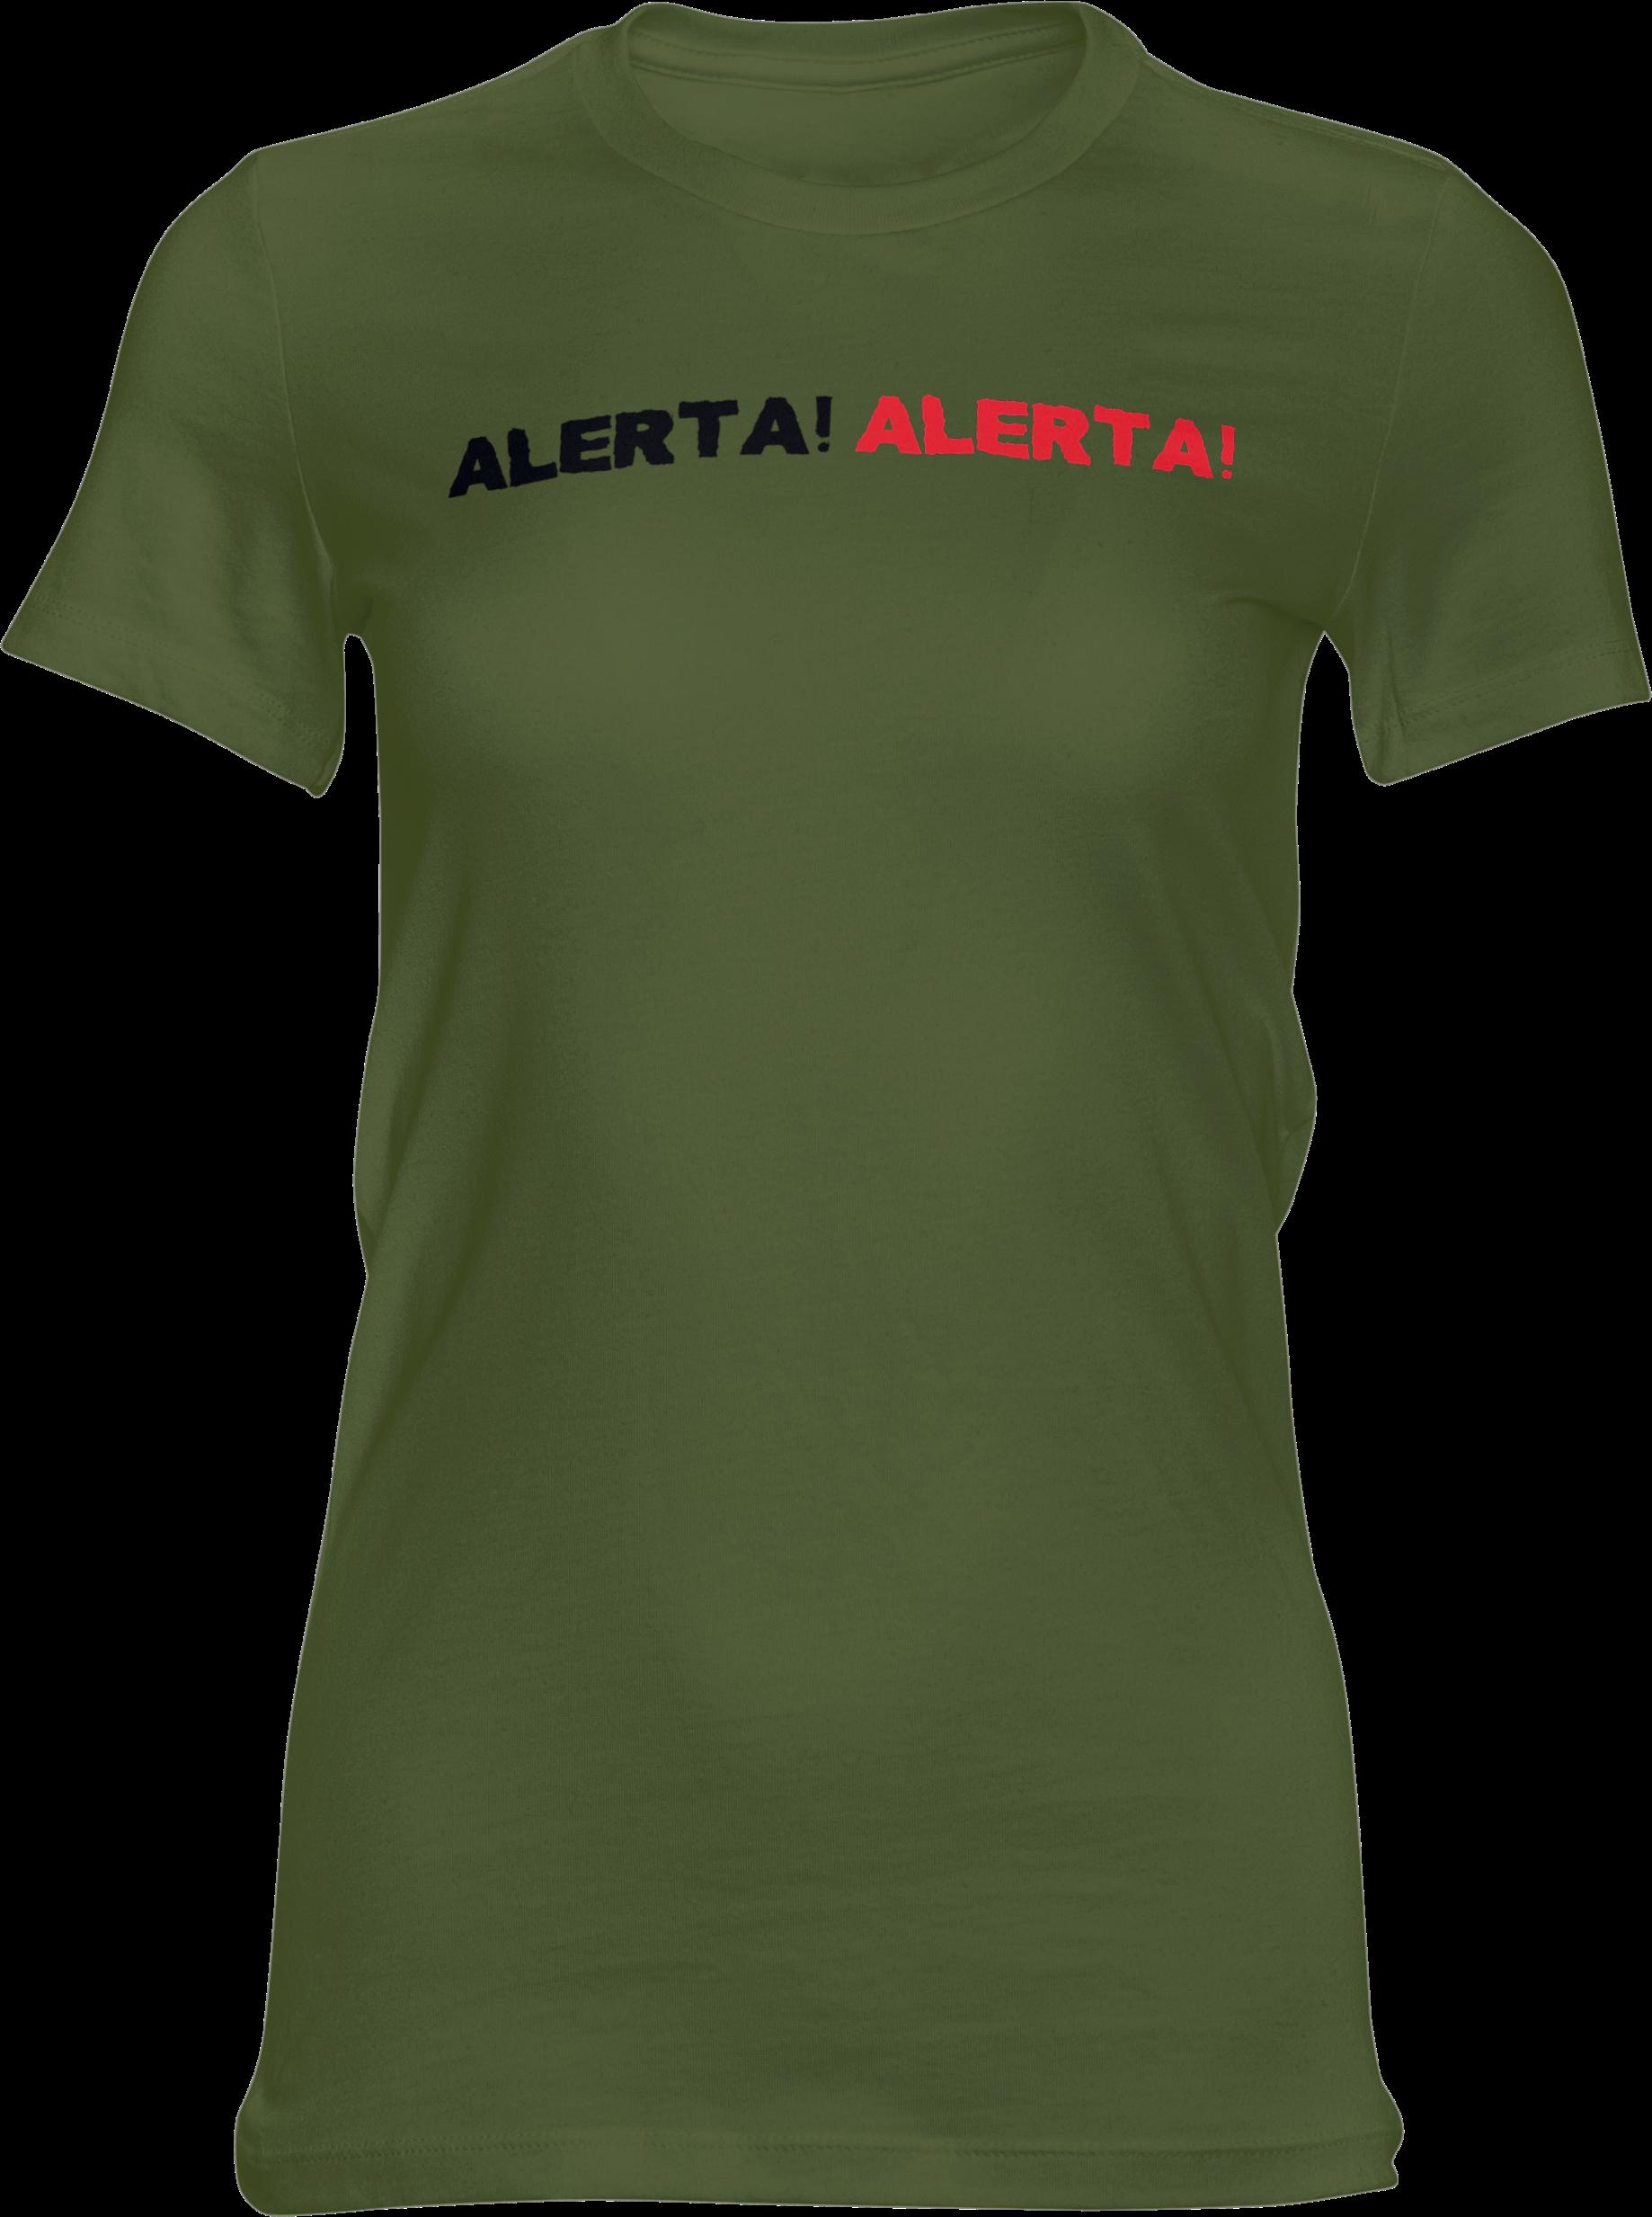 Motiv-Shirt – Alerta Alerta – Girlie-Shirt (grün)